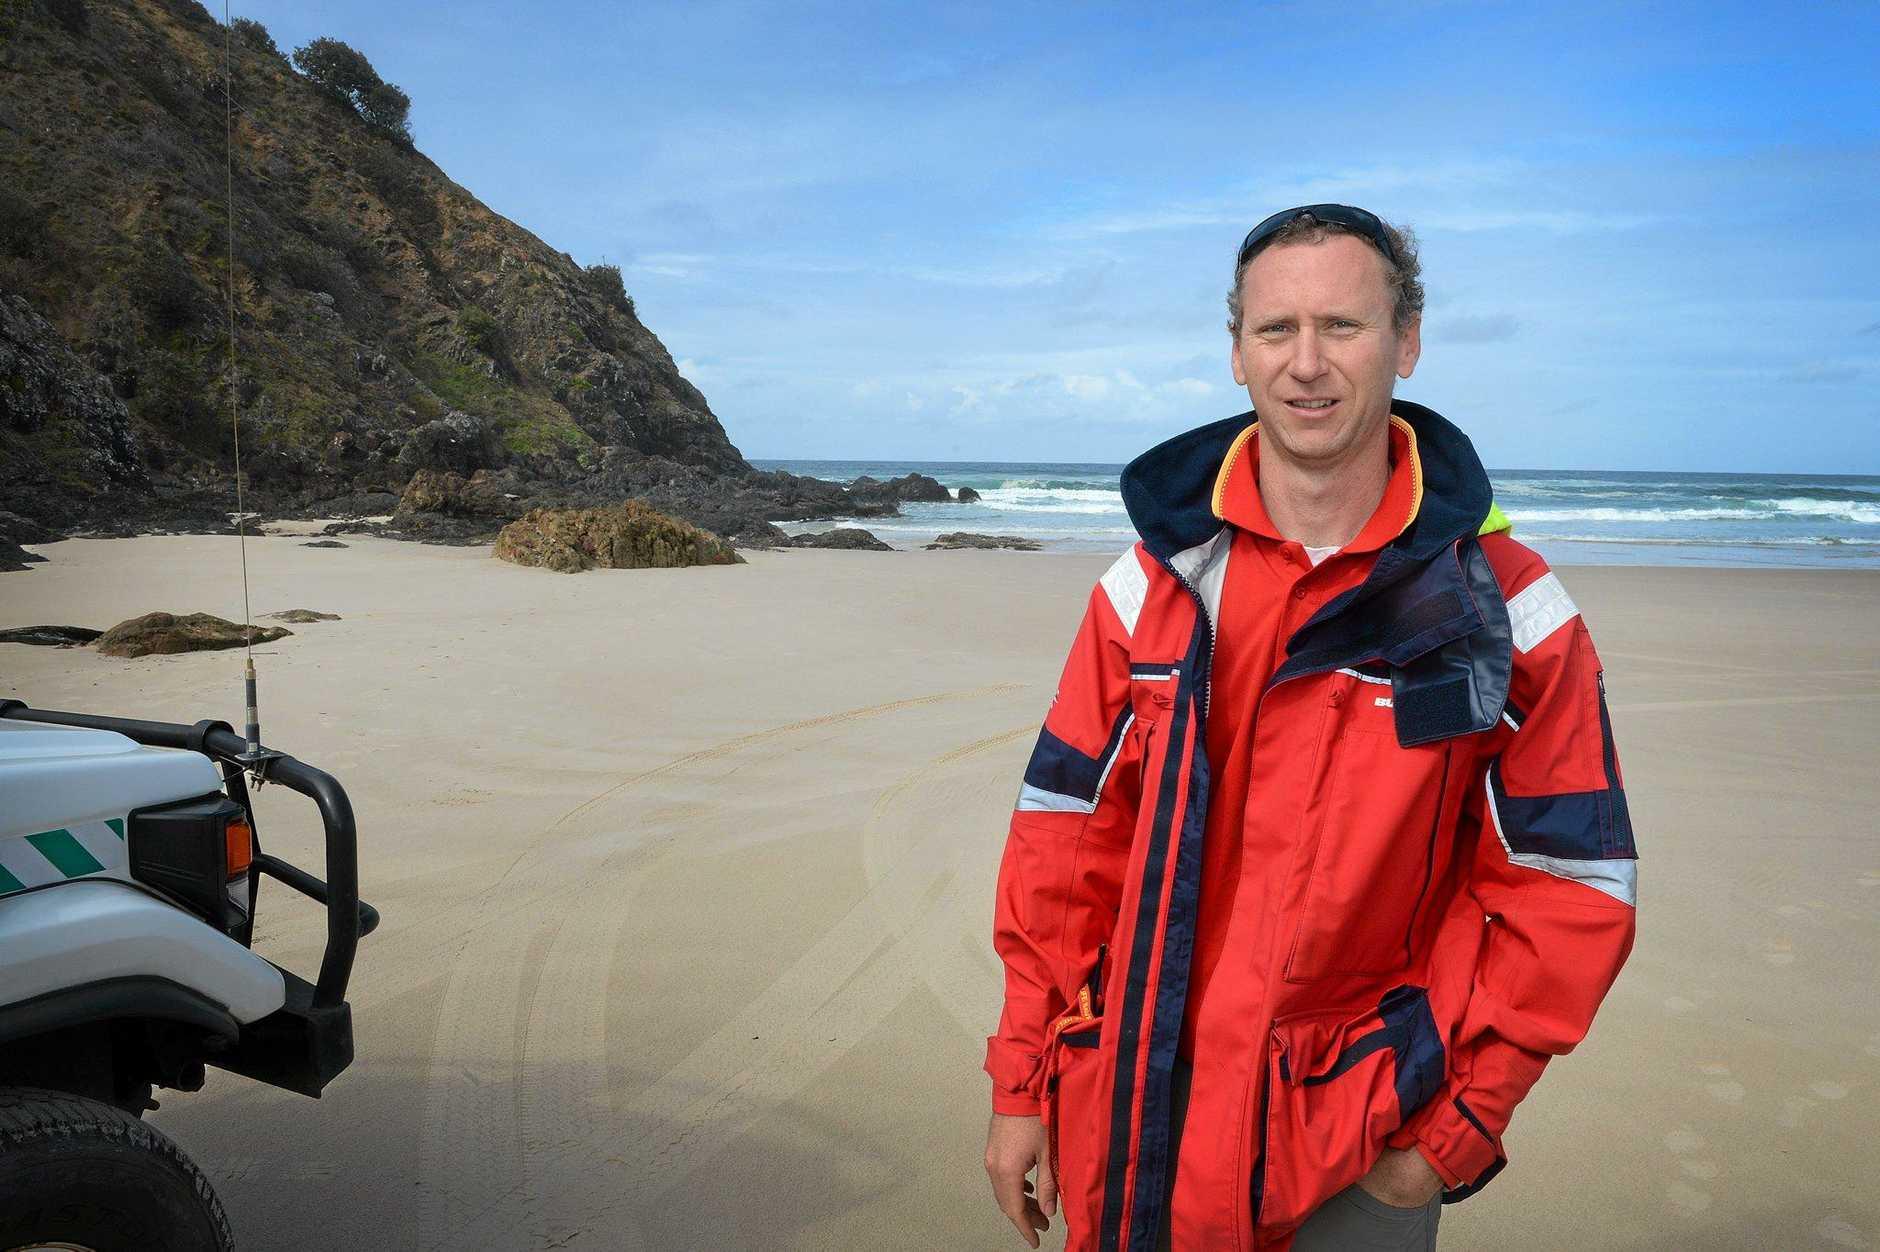 Jimmy Keough, surf life saving Far North Coast.Photo : Mireille Merlet-Shaw/The Northern Star